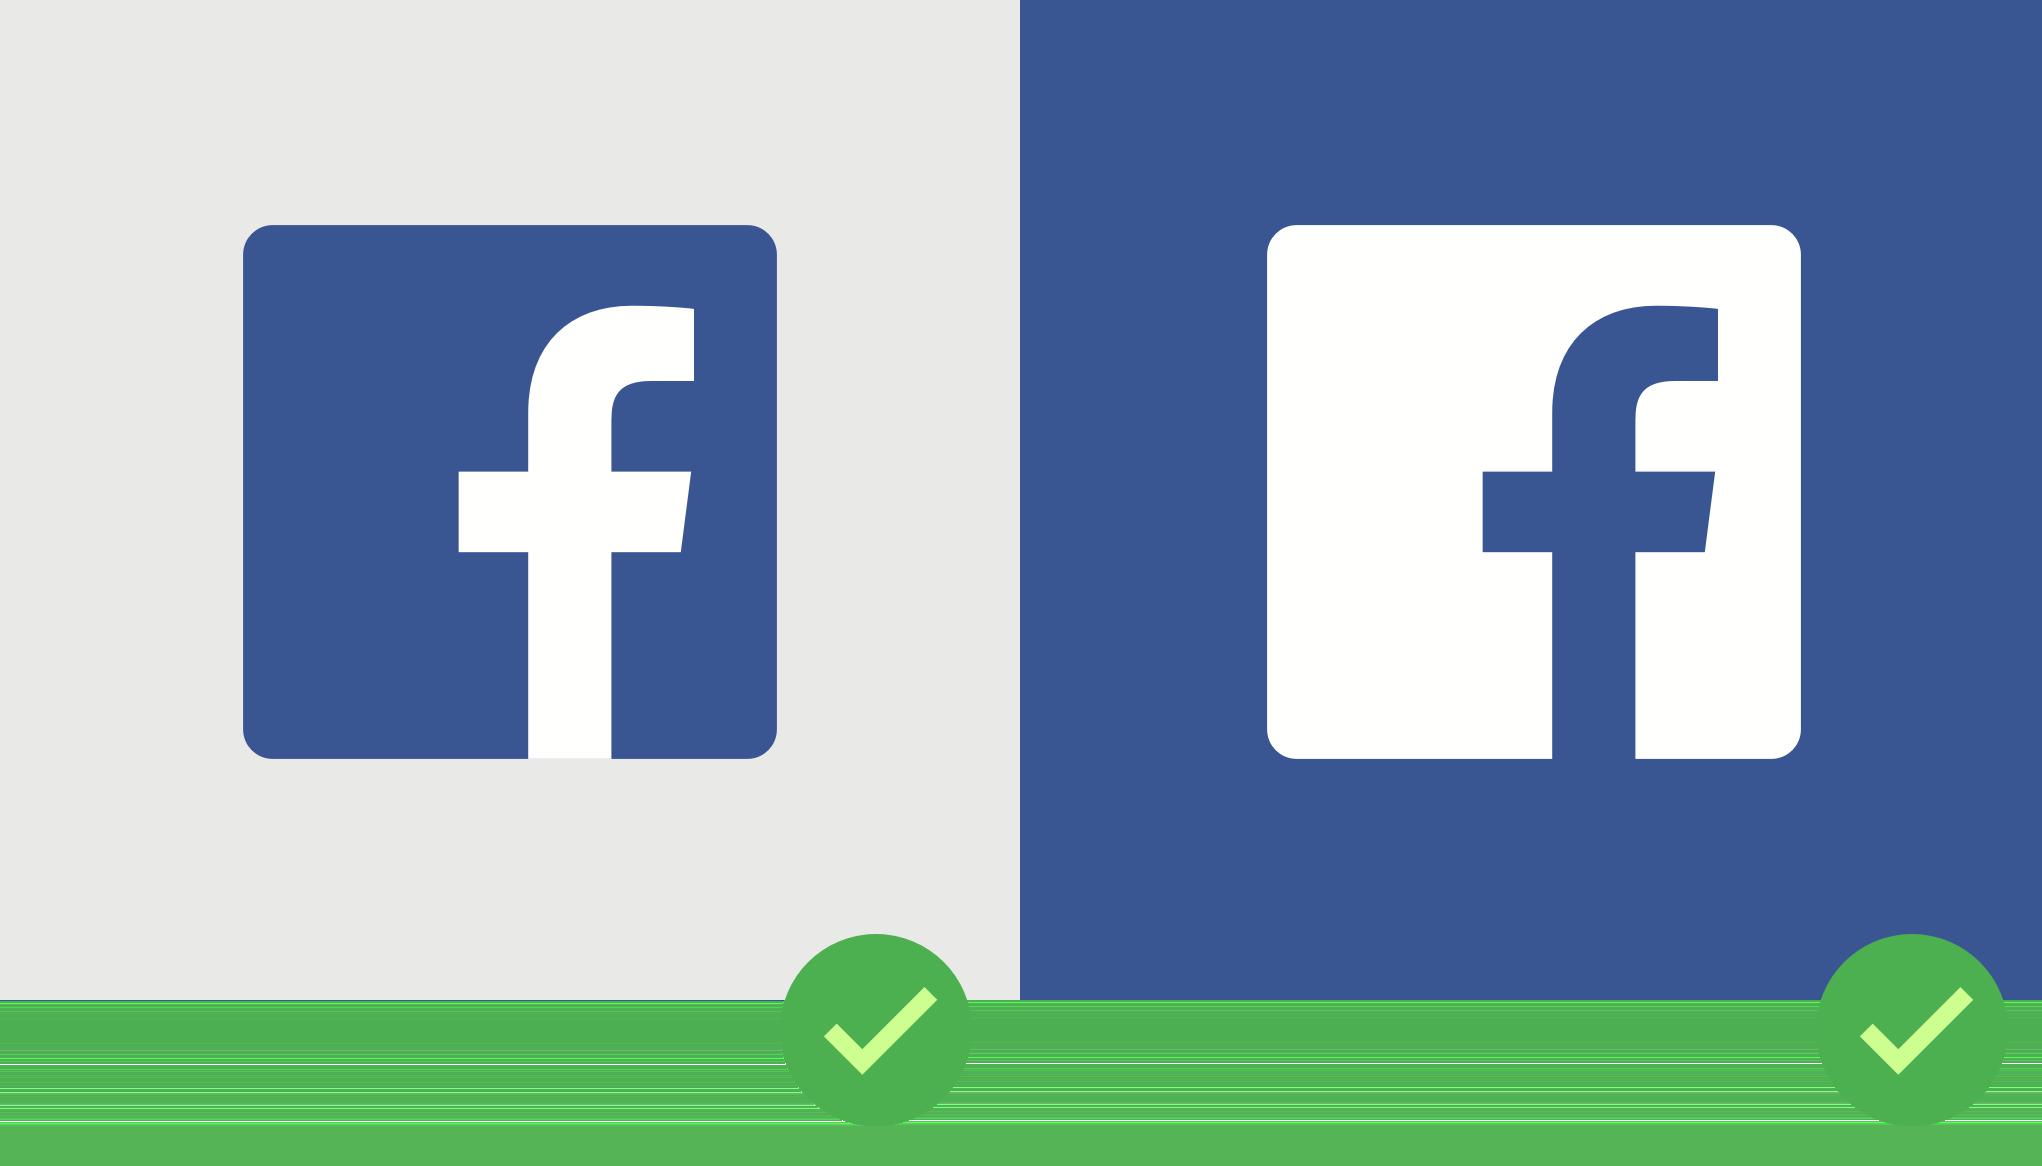 Proper Facebook Logo - Ama Flat Track Vector, Transparent background PNG HD thumbnail